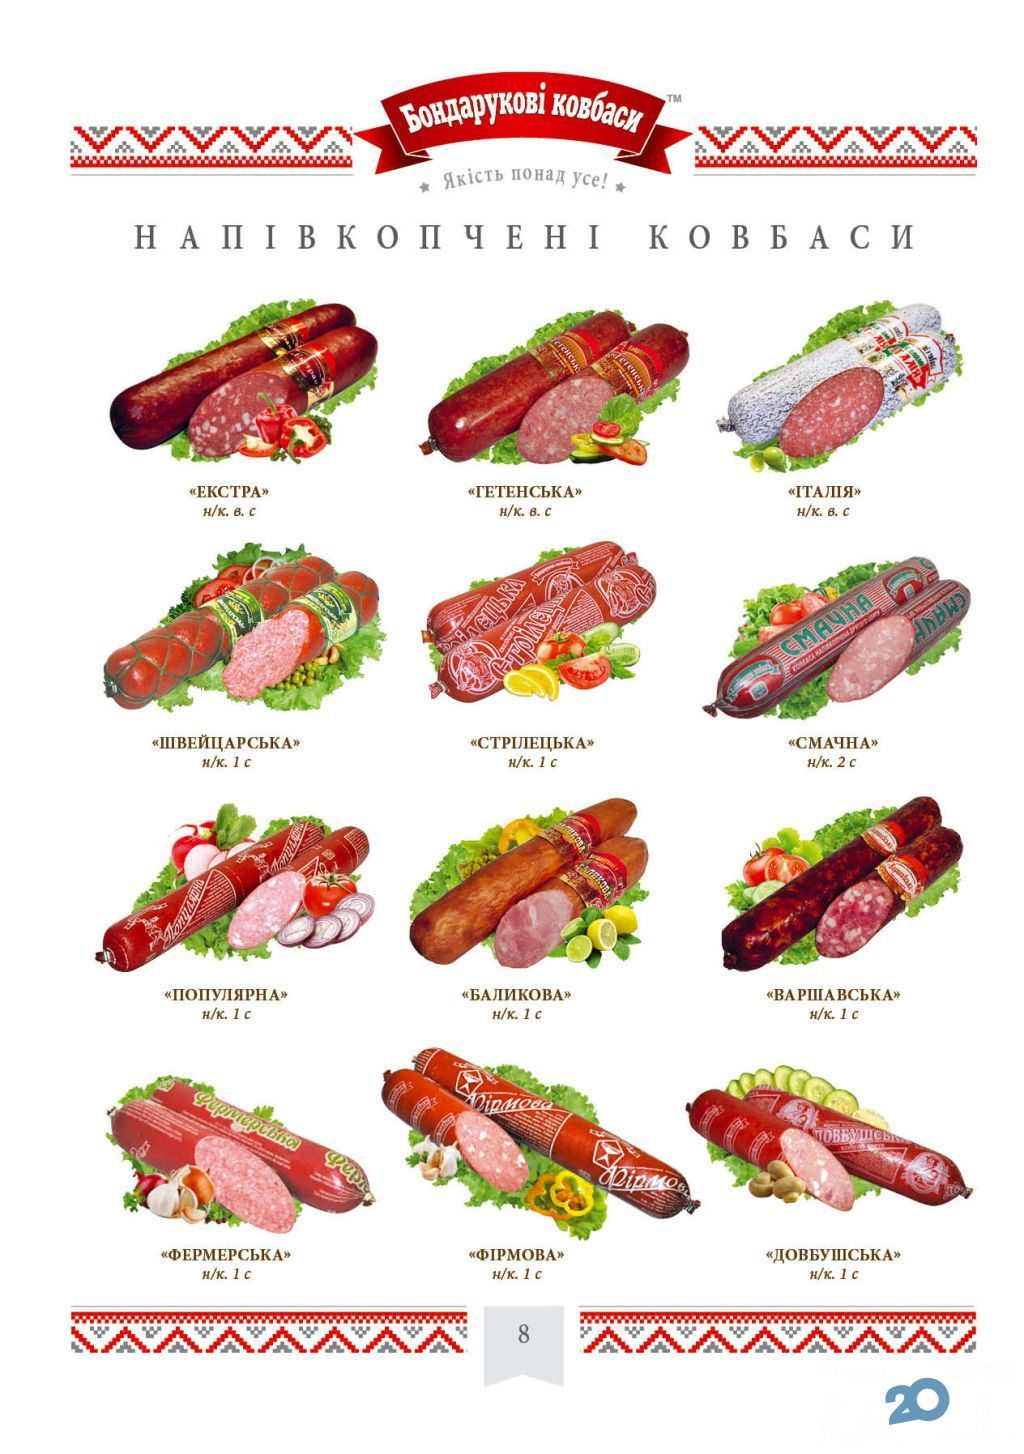 Бондарукові ковбаси, м'ясний магазин - фото 8